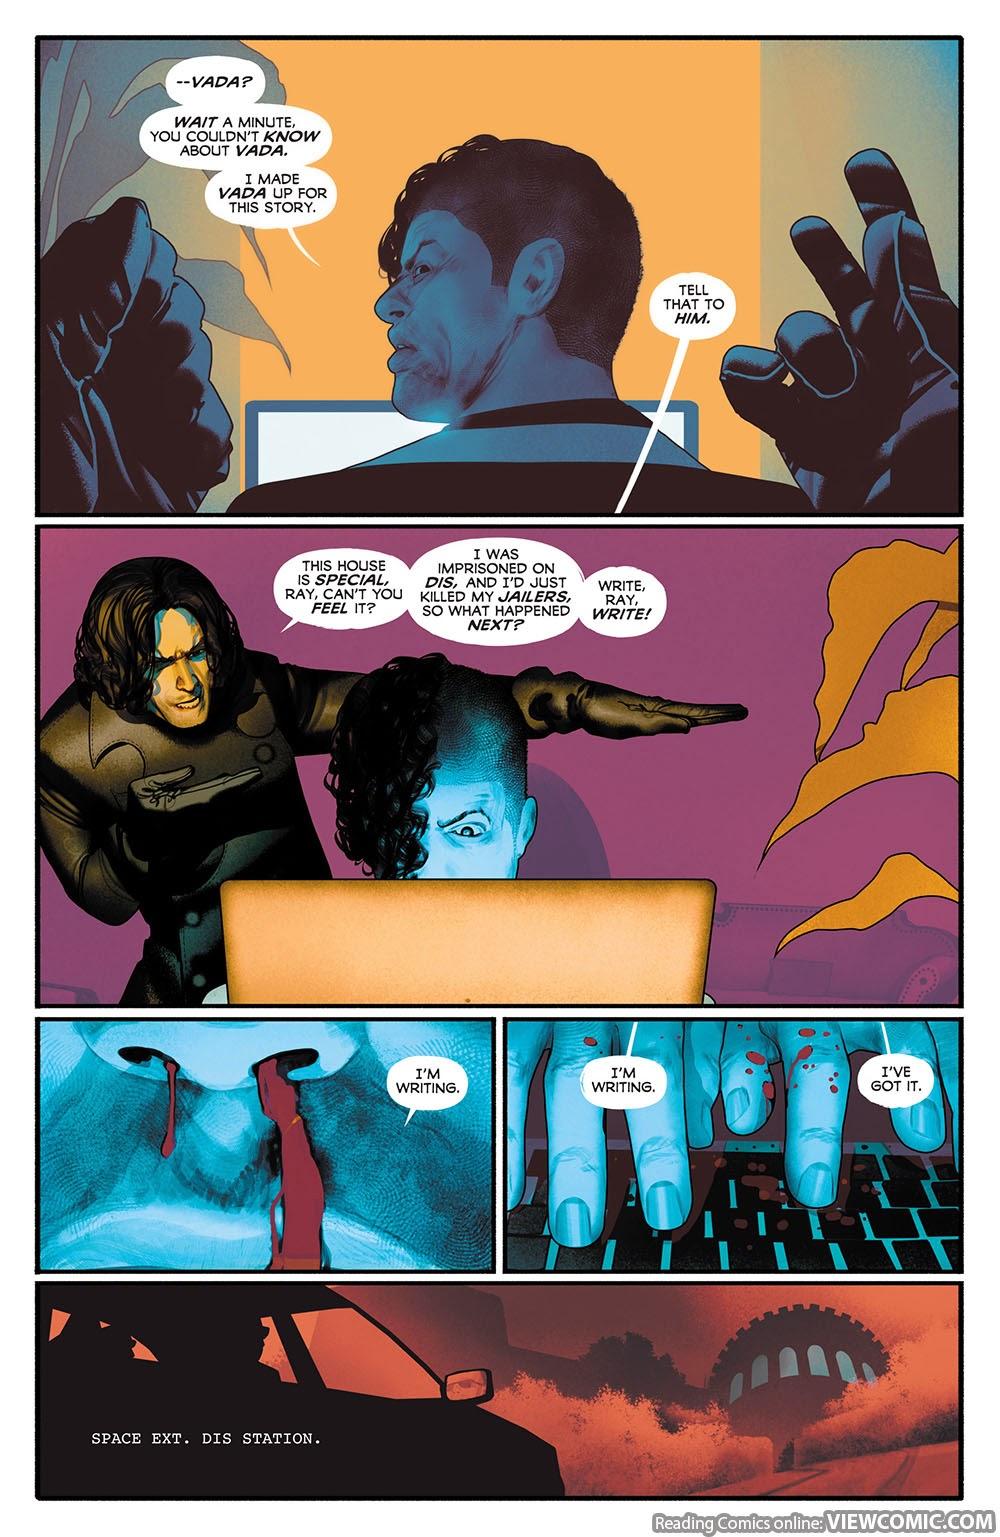 Annihilator 002 (2014) ……………………………… | Viewcomic reading comics online for  free 2019